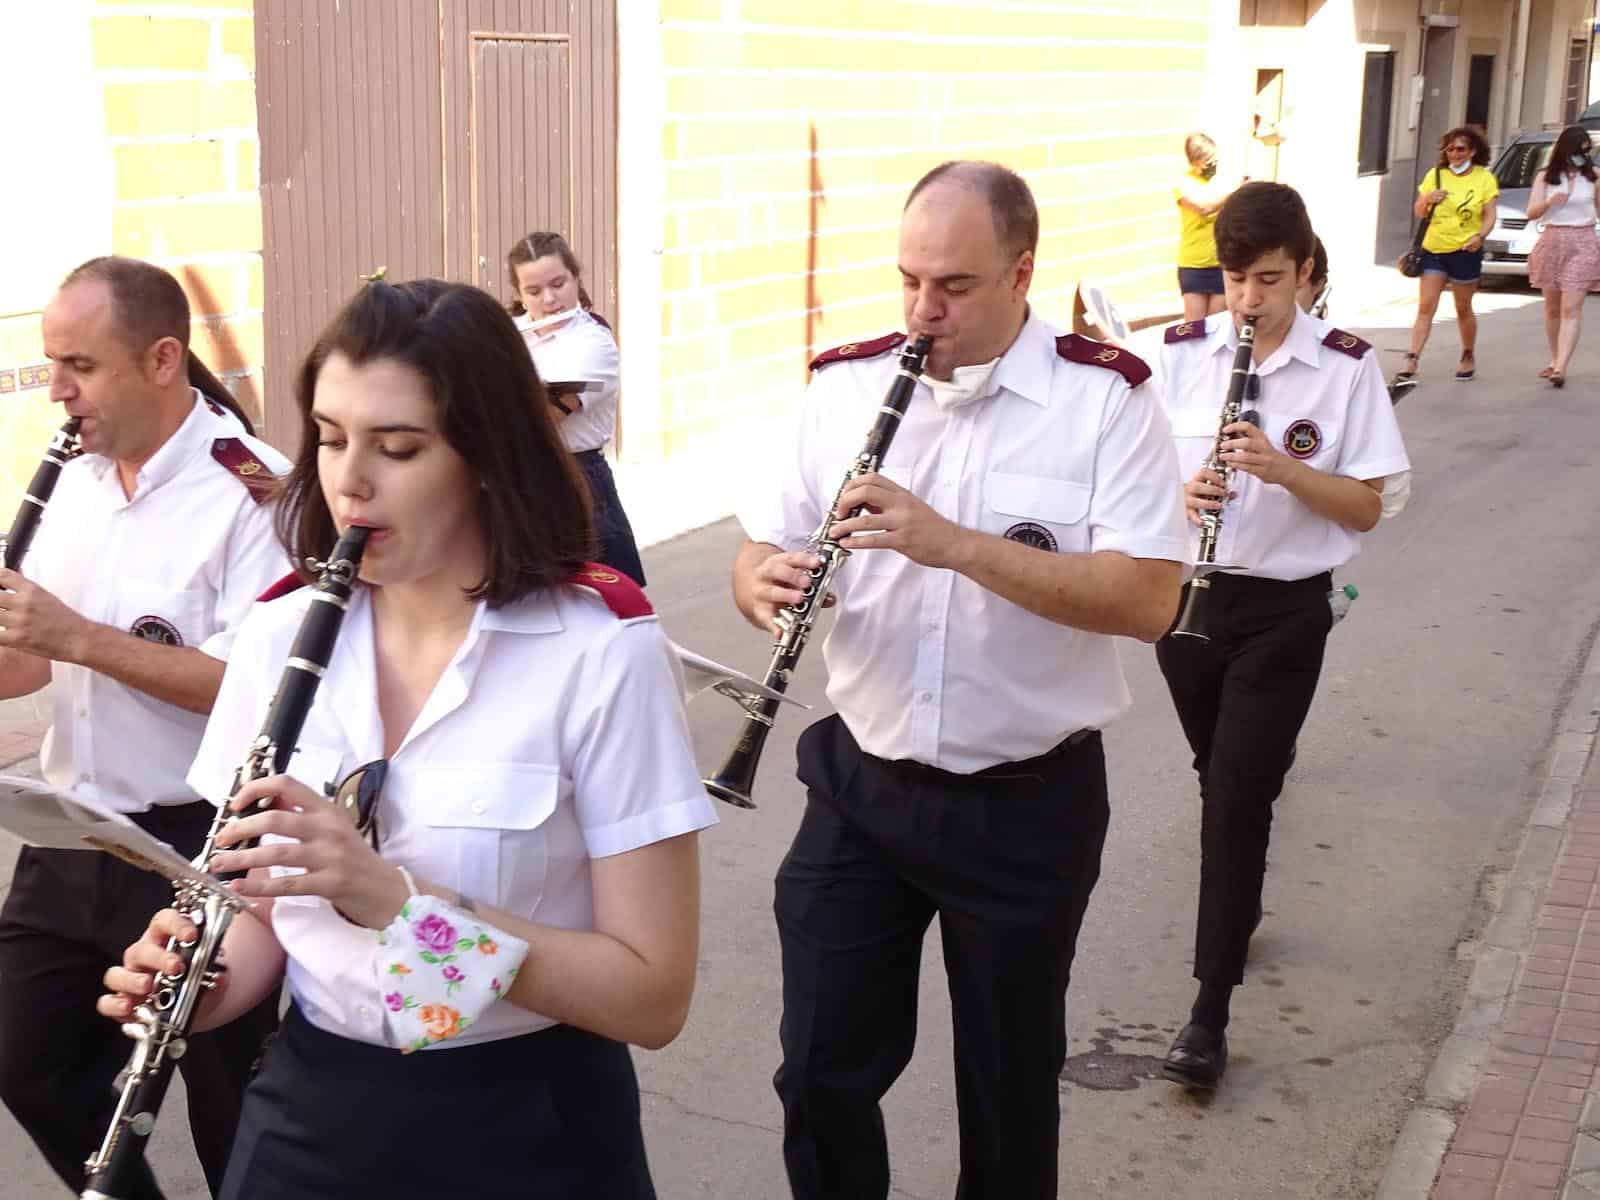 La UMQ lleva la música festiva por las calles de Quintanar de la Orden 14